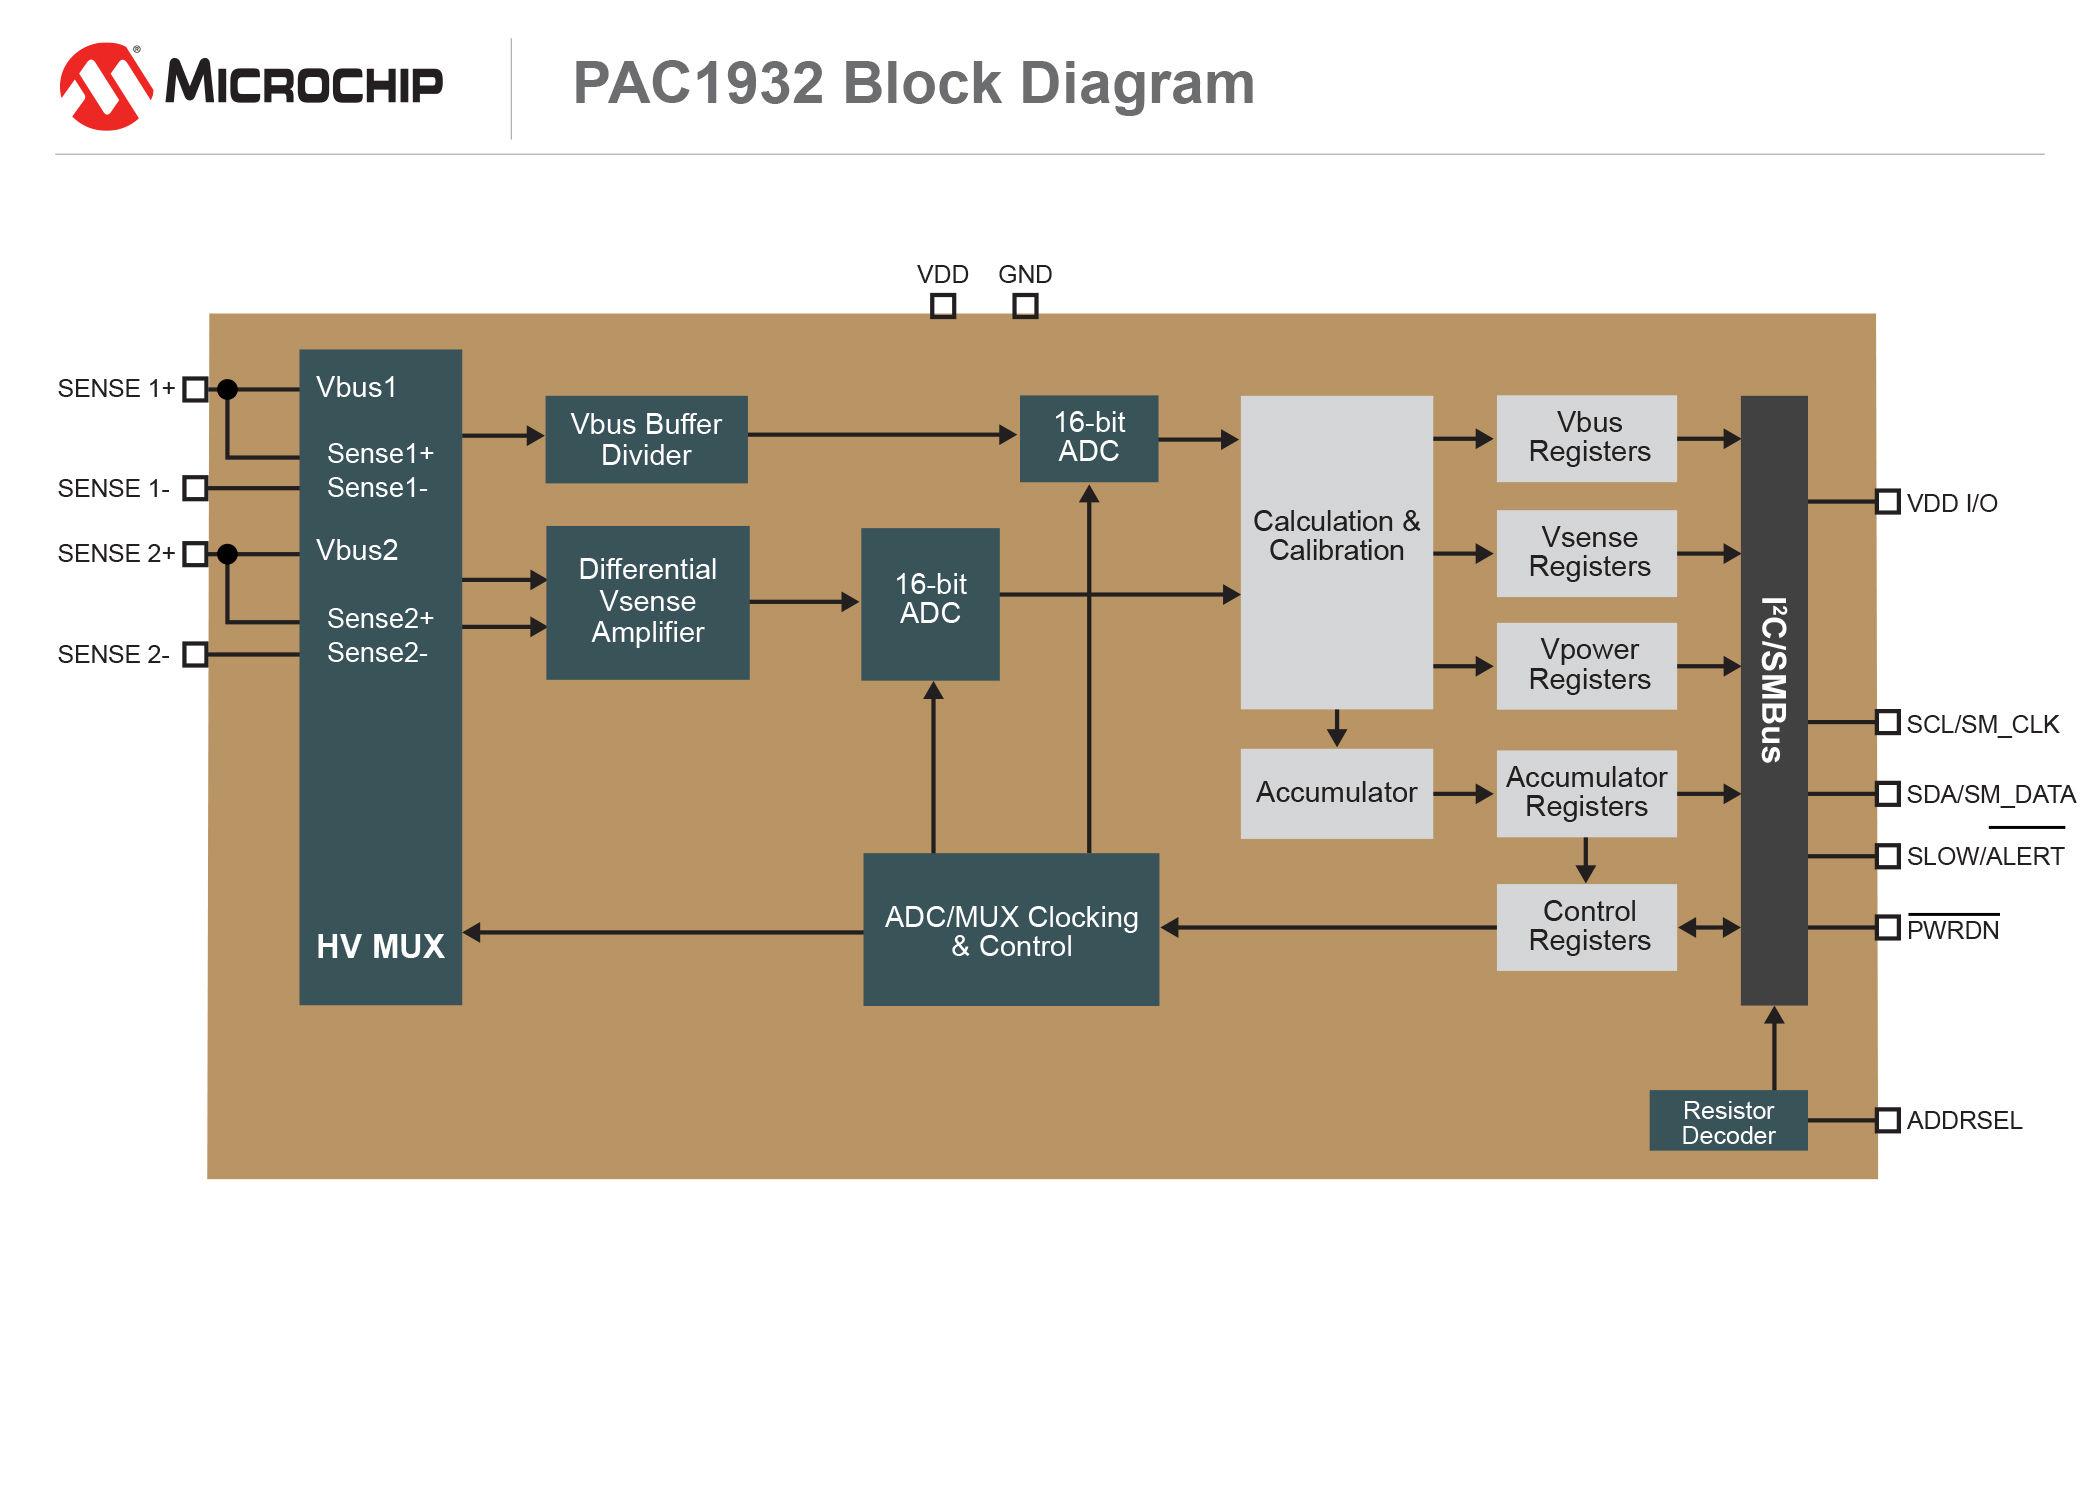 170707-DIAG-Lucio-Article-graphic